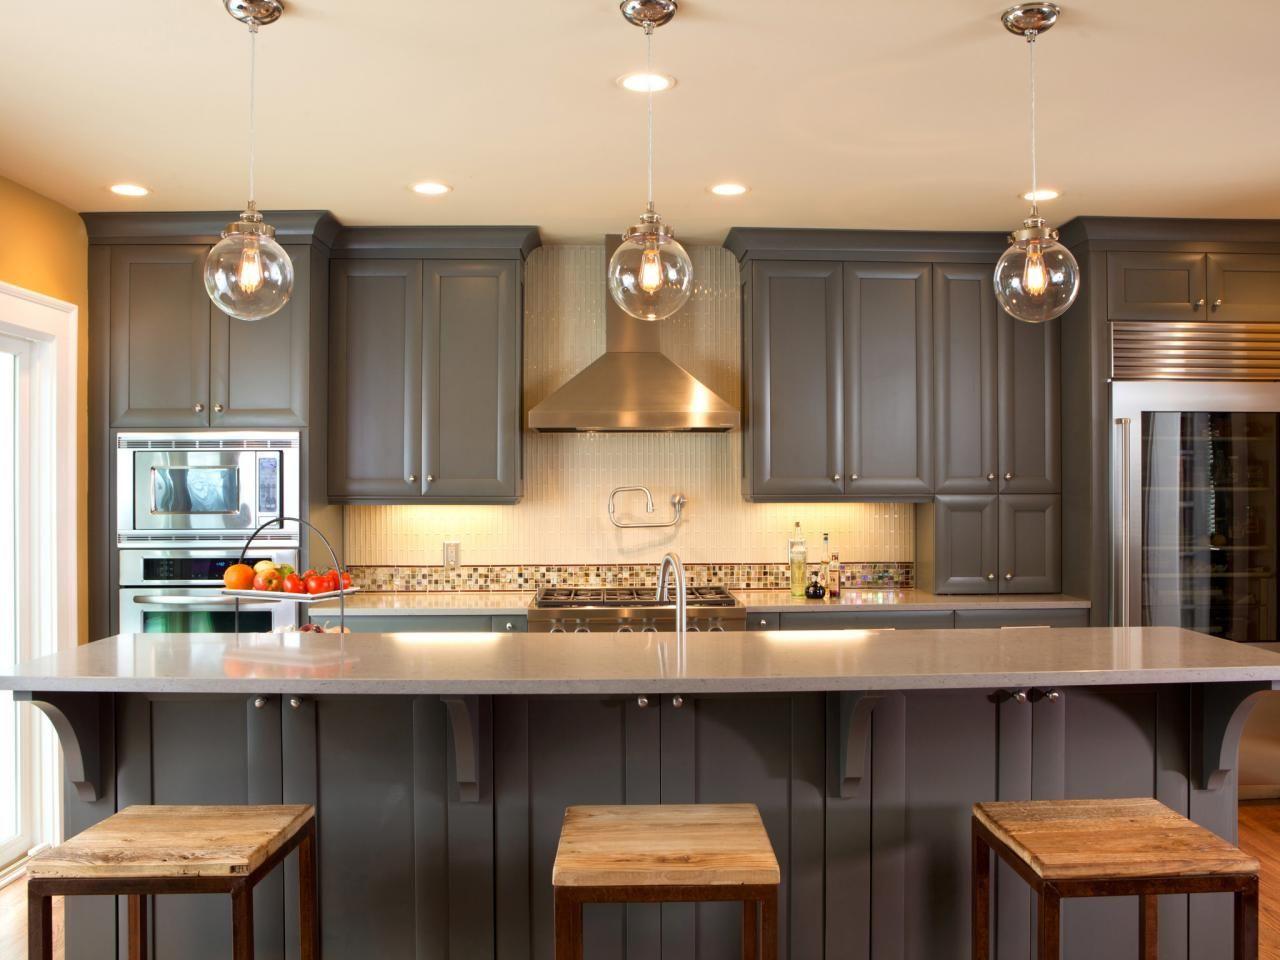 desain lemari kabinet dapur bergaya vintage